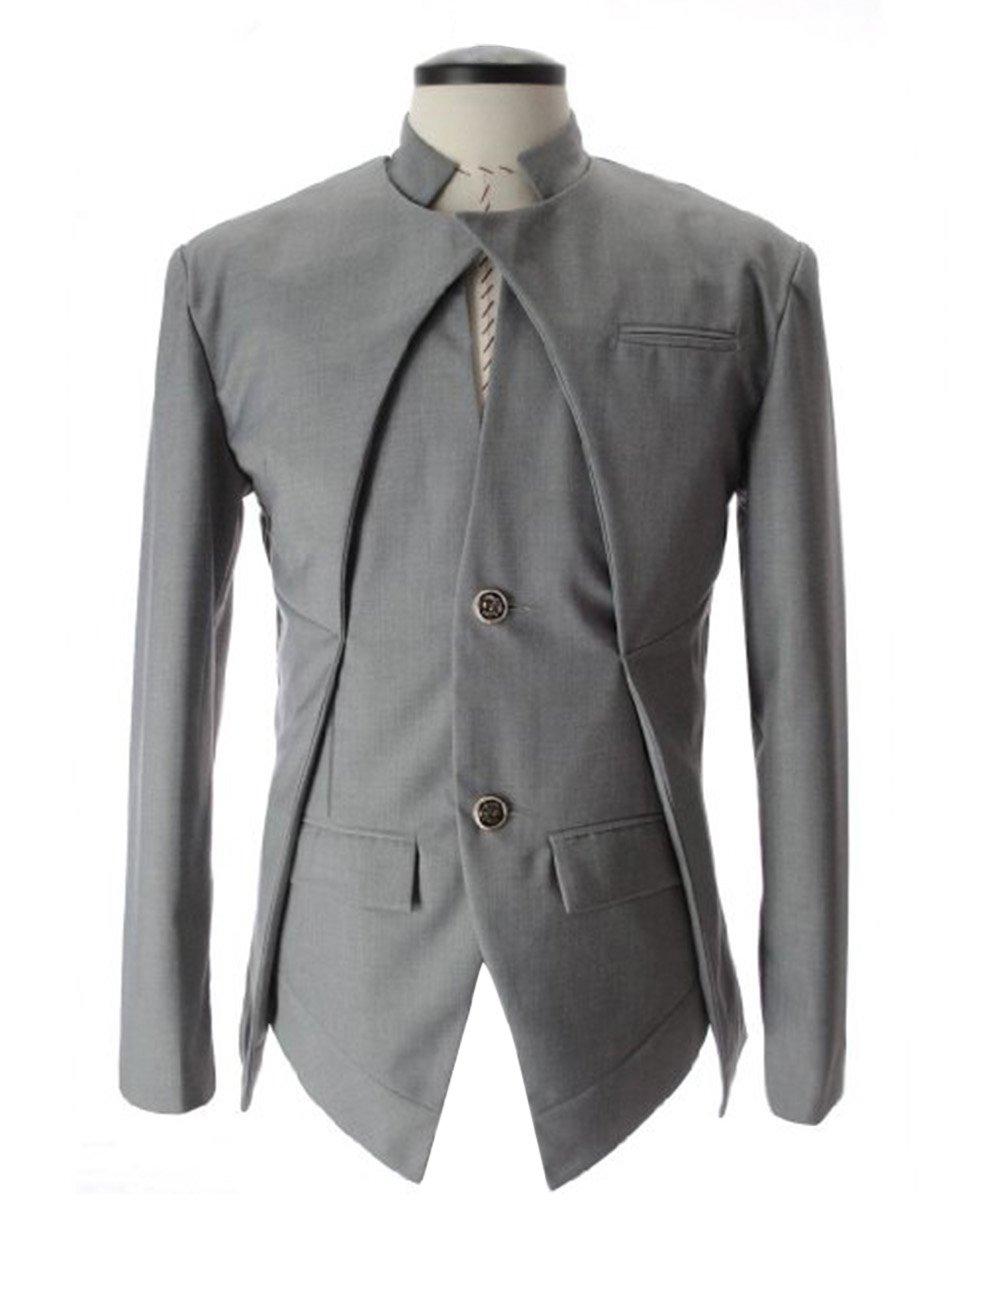 ?Men's Long Sleeve Stand-up Collar Asymmetric Suit Jacket Black L